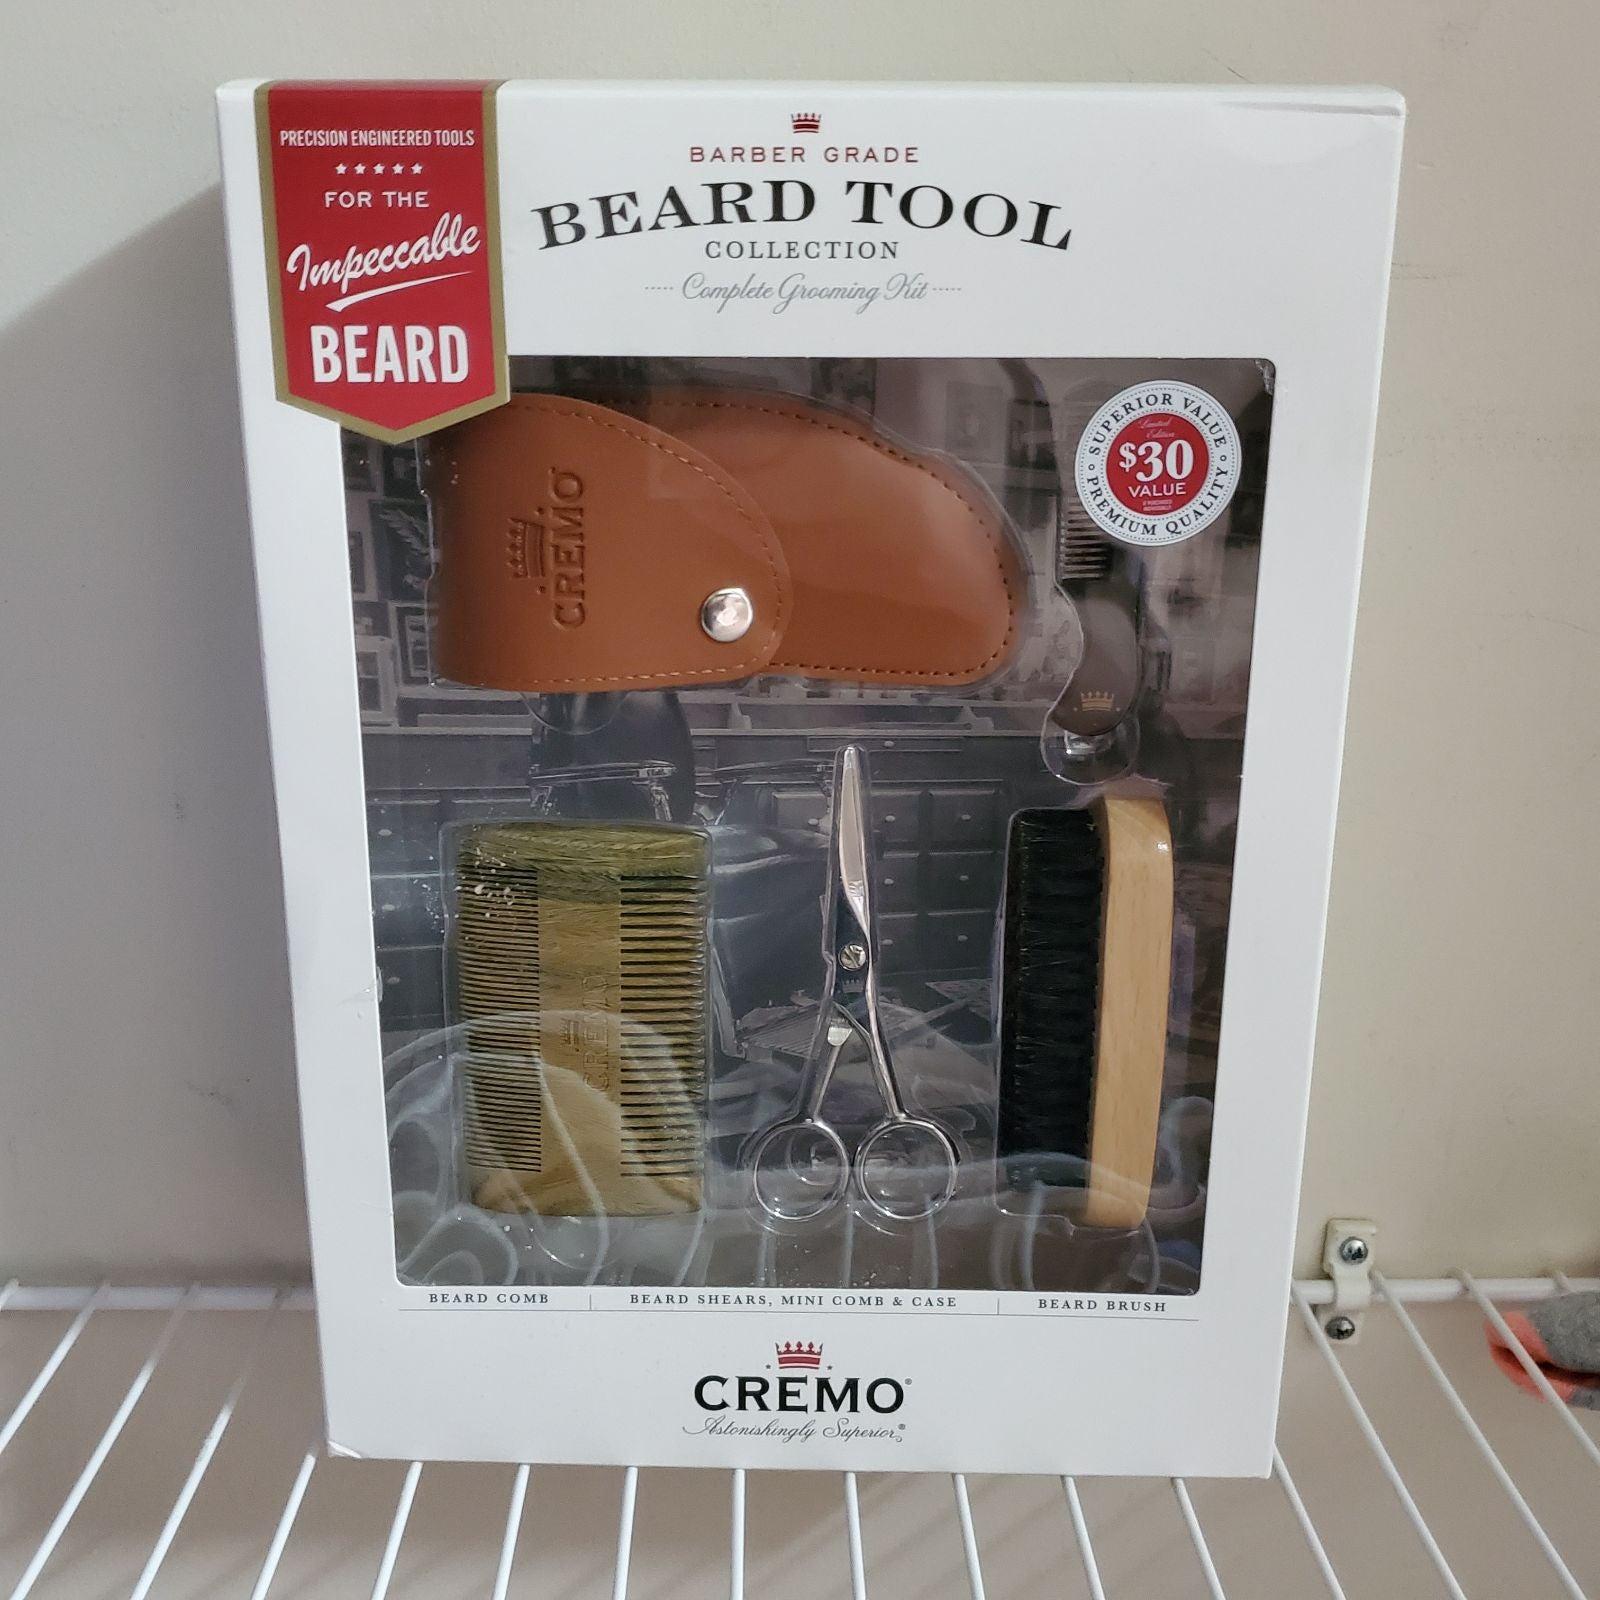 New Beard Grooming Kit